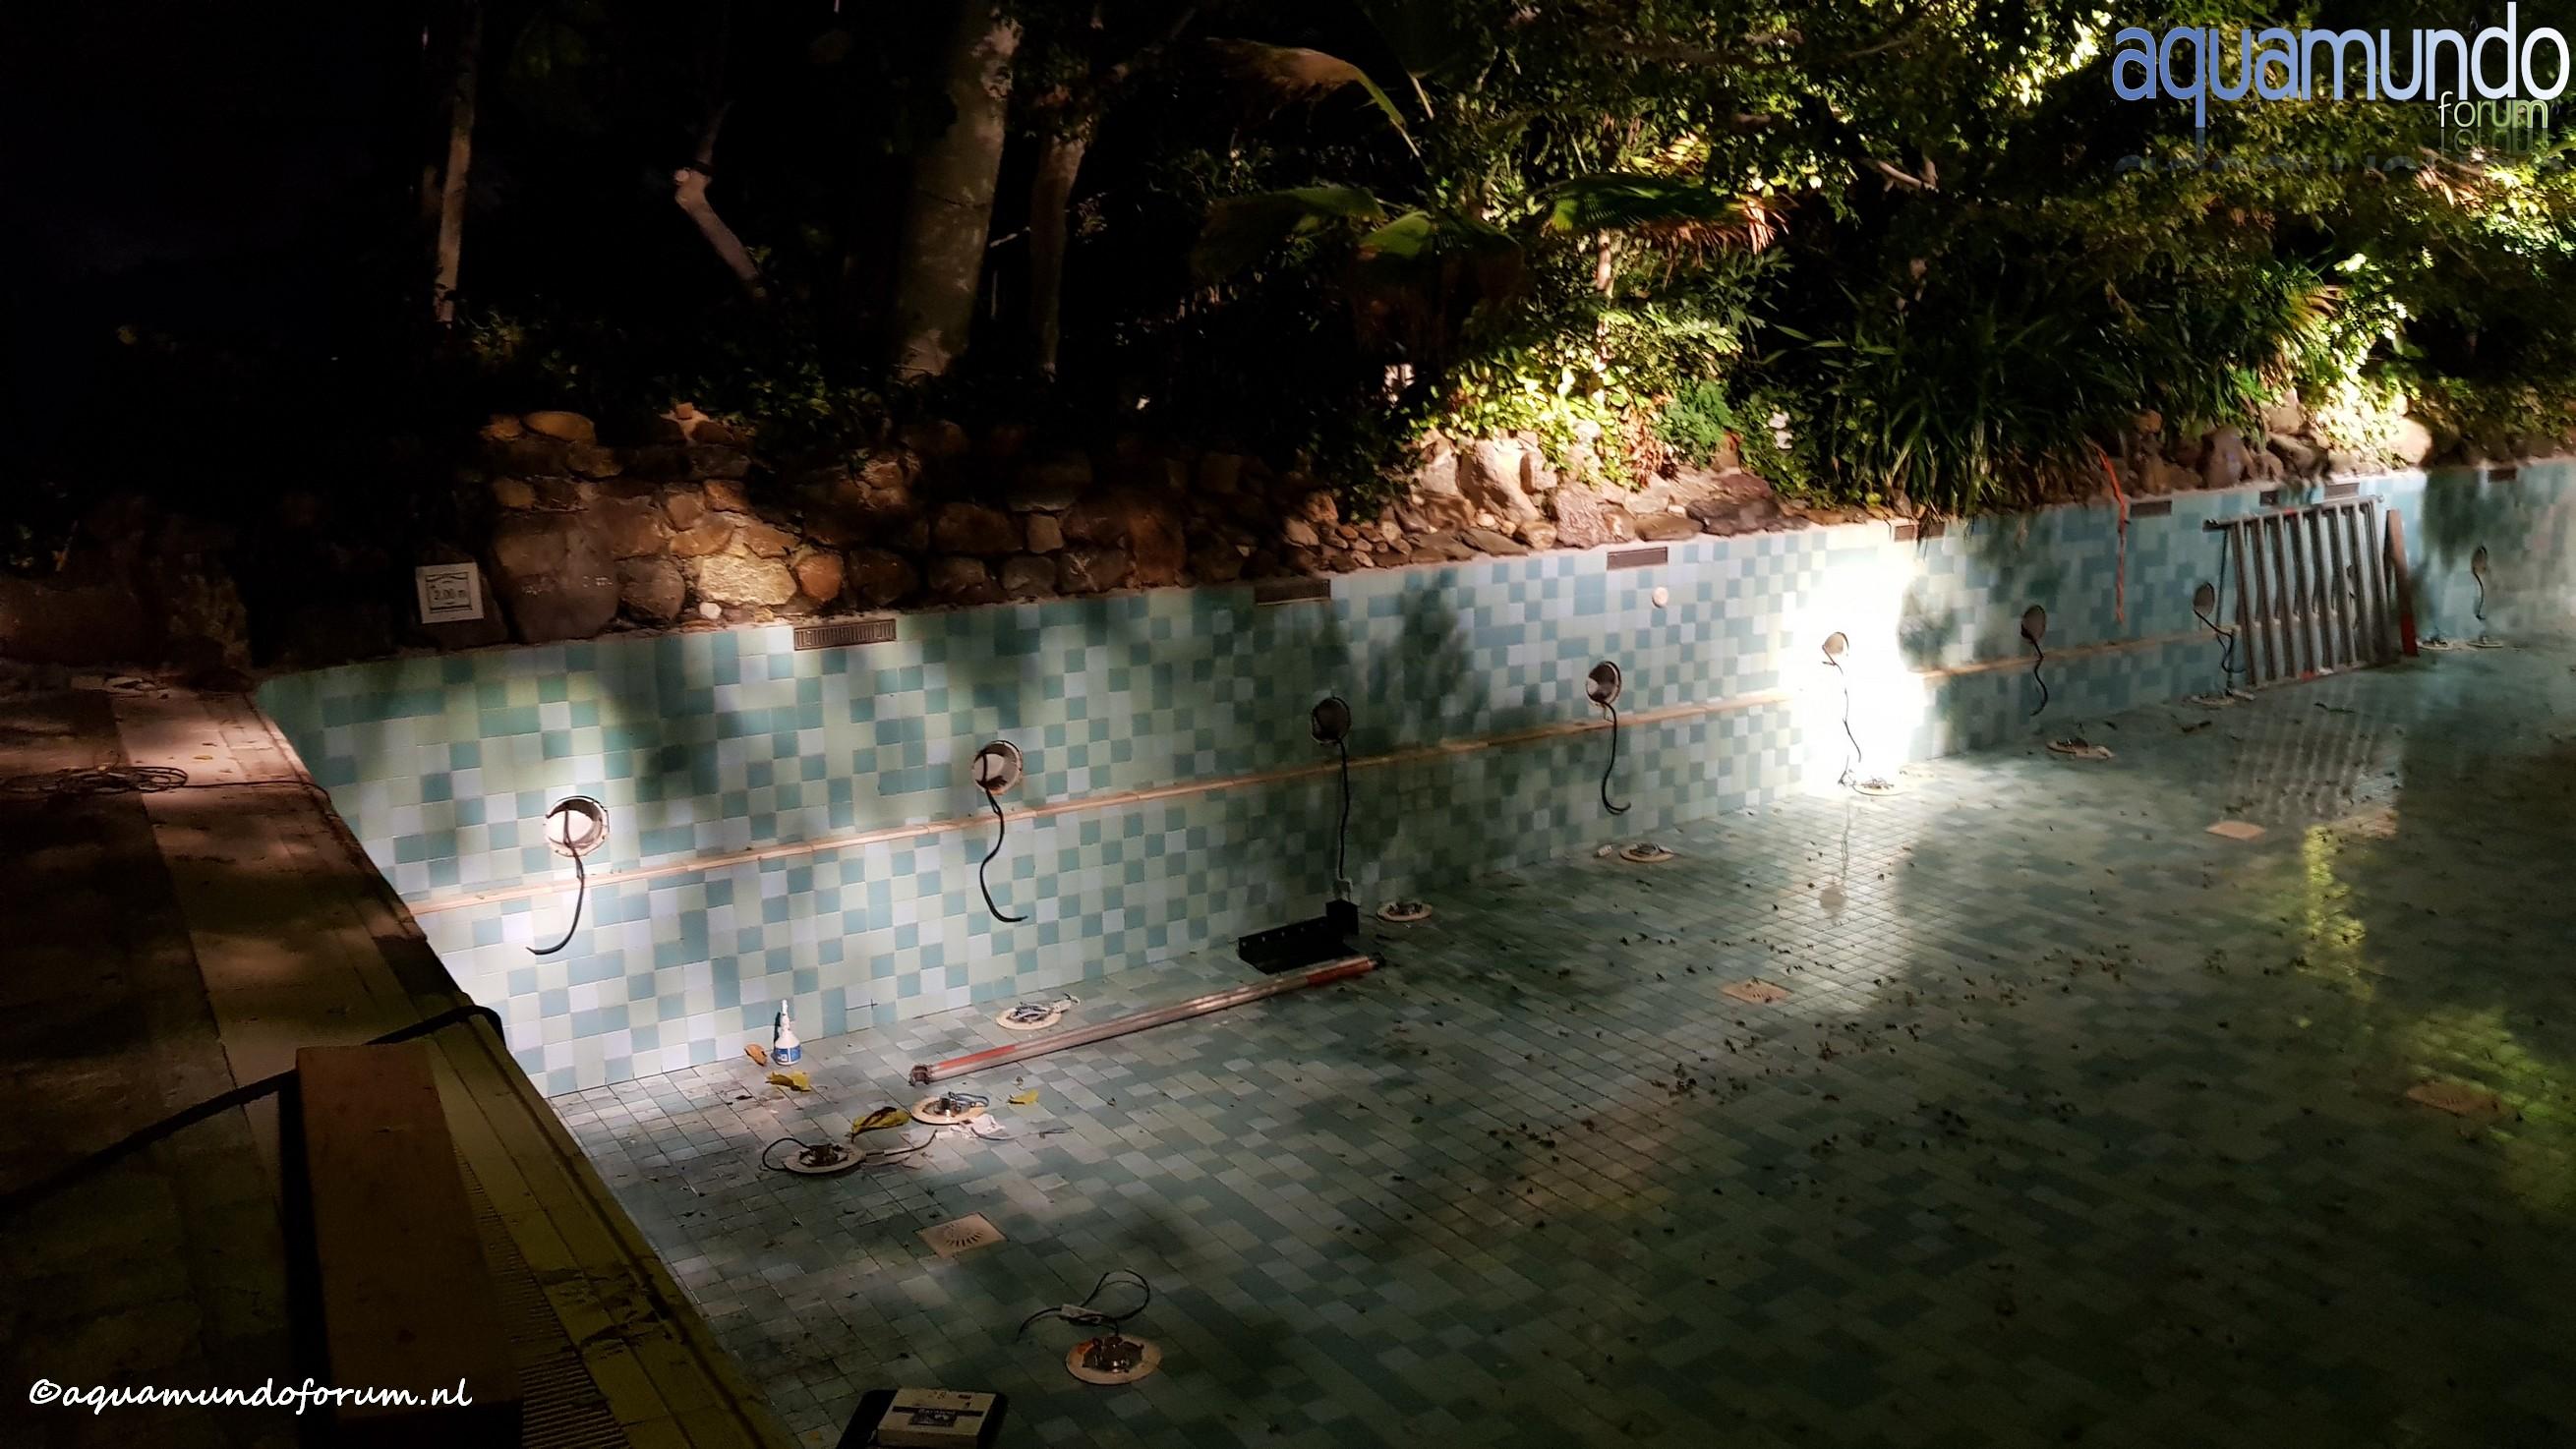 Onderhoud 25 meterbad Aqua Mundo Center Parcs De Huttenheugte (6).jpg